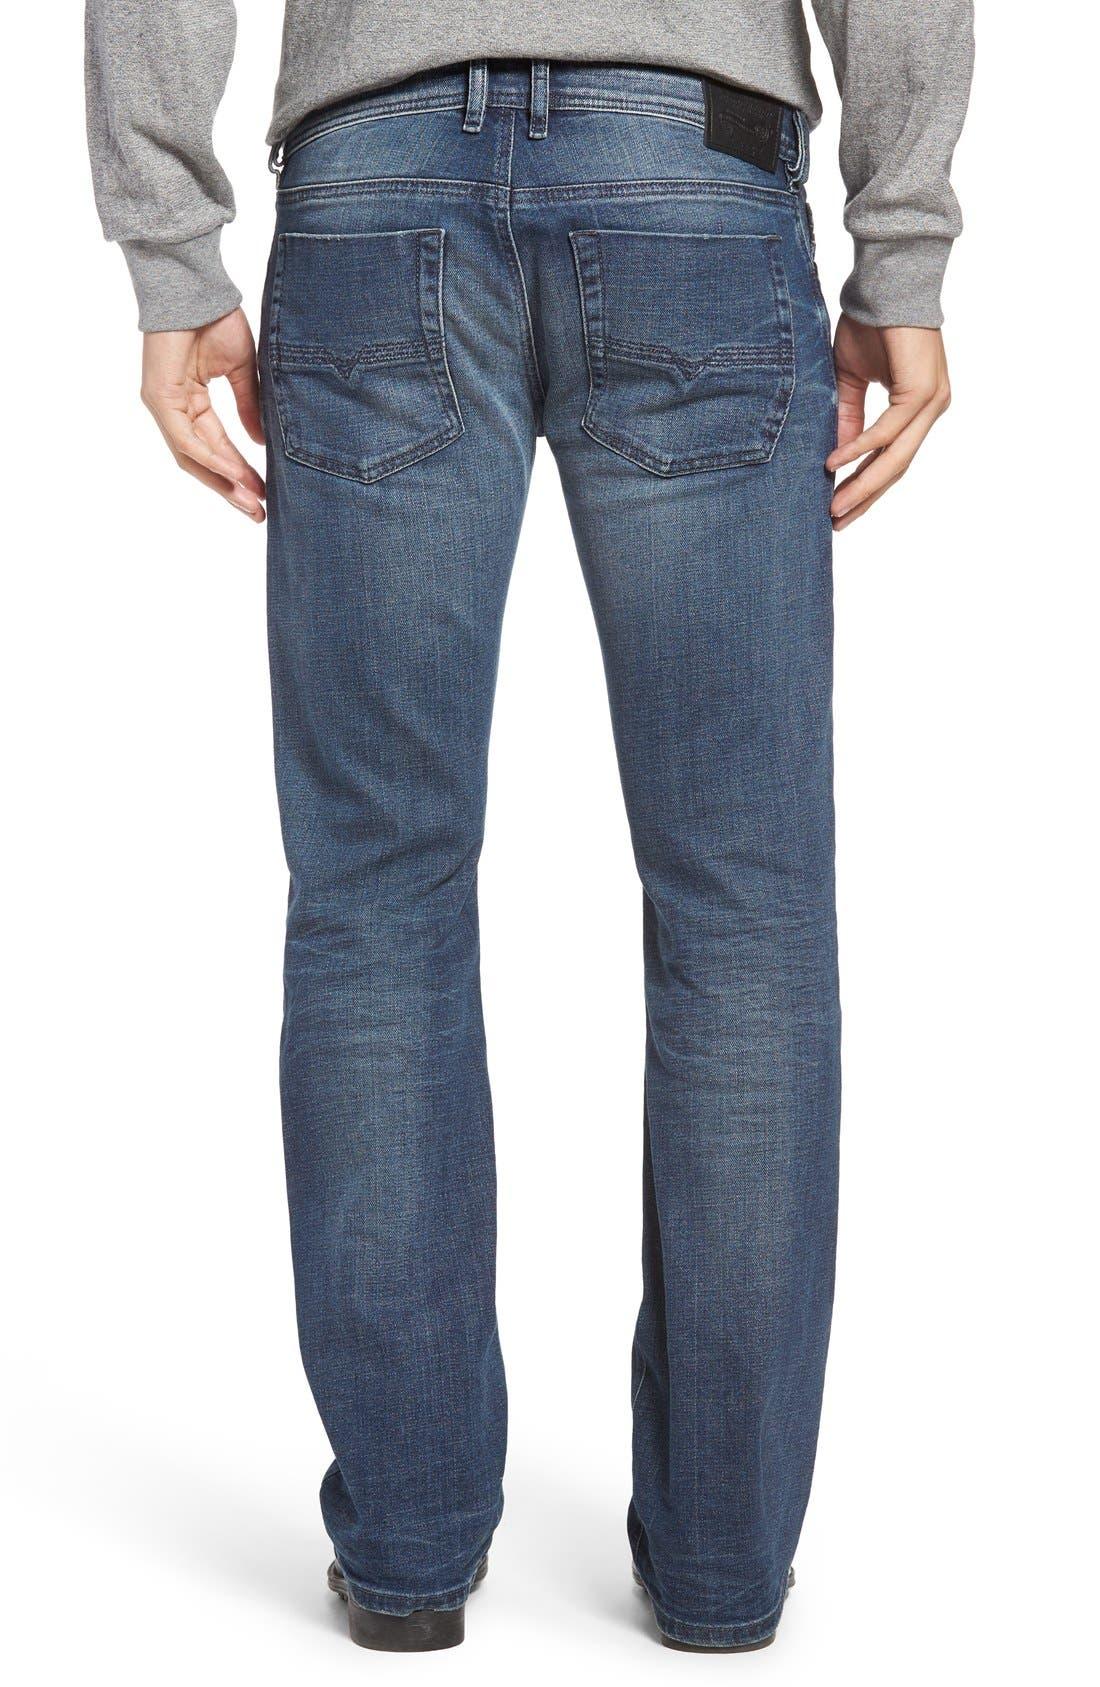 Zatiny Bootcut Jeans,                             Alternate thumbnail 2, color,                             857N